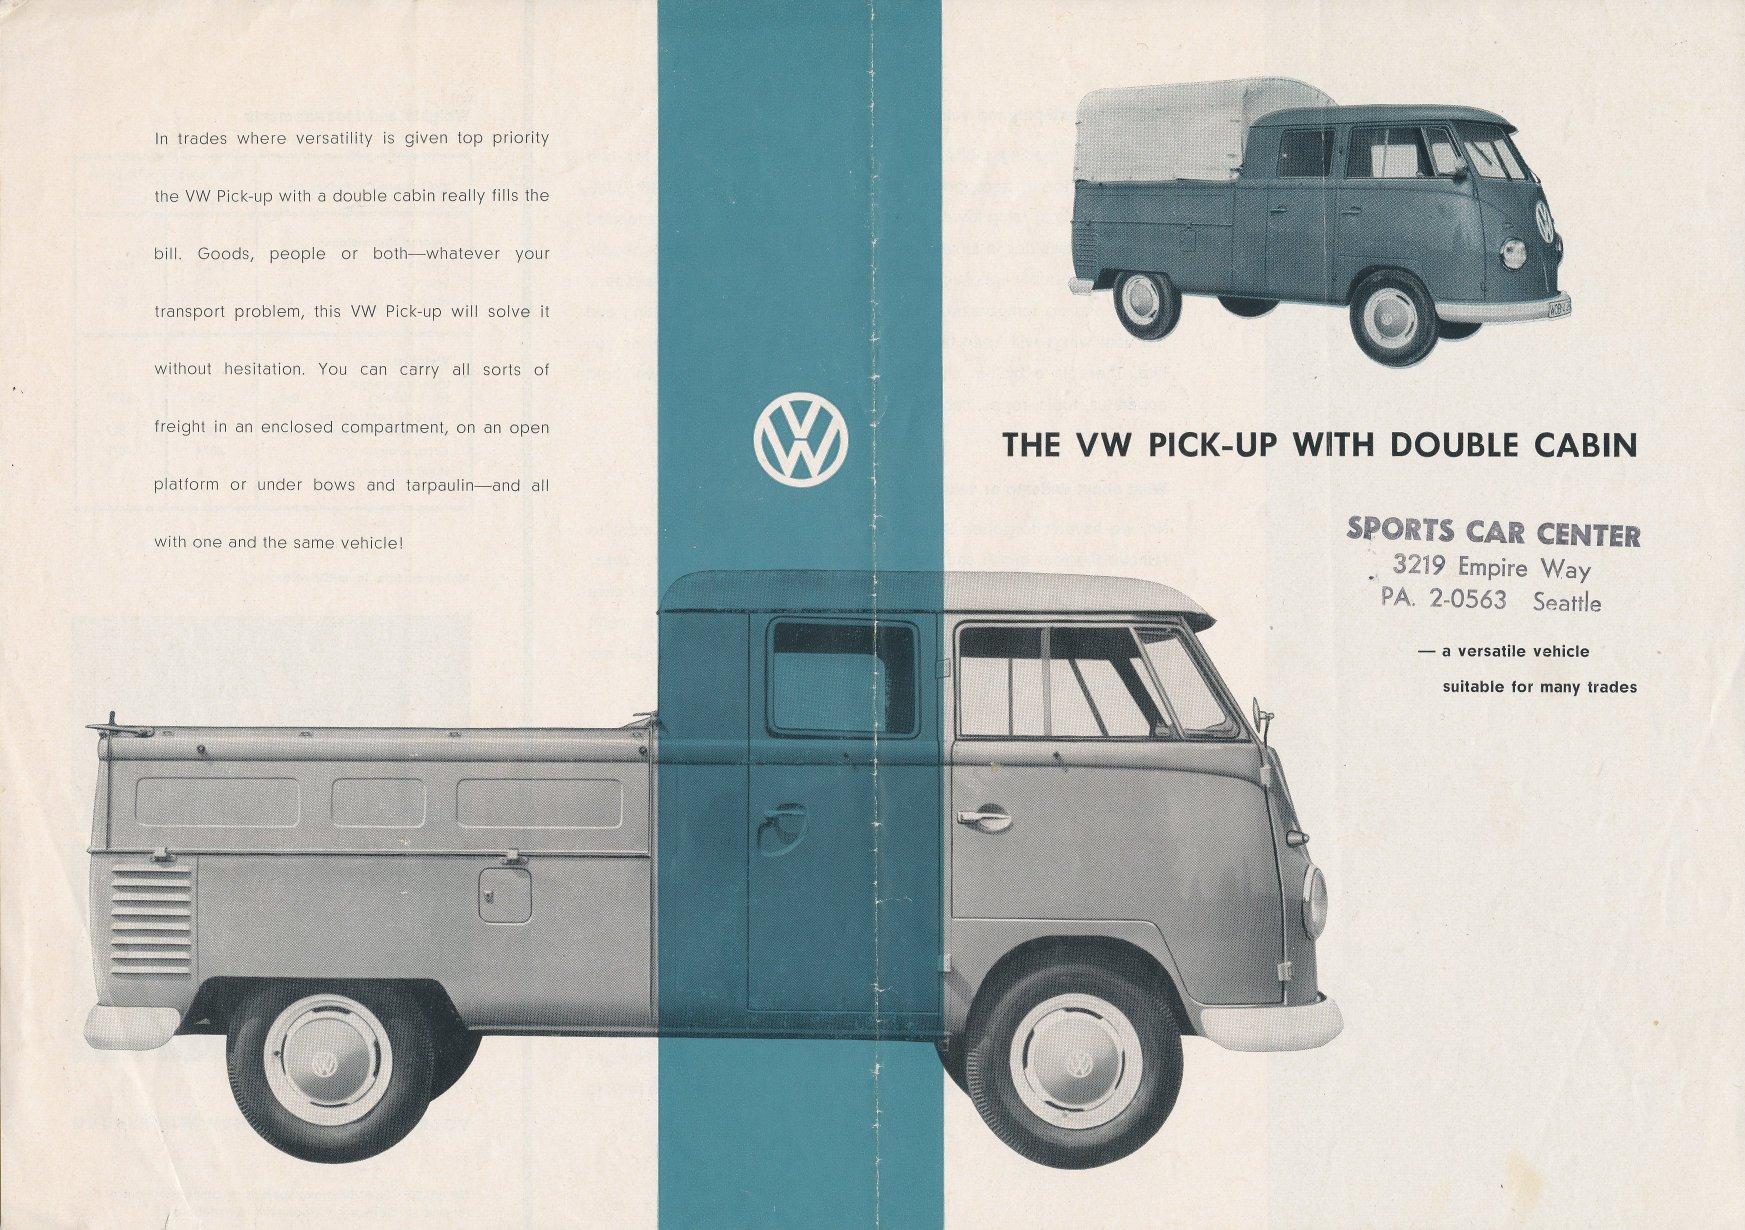 Vw archives 1959 vw double cab flyer for Garage volkswagen flers